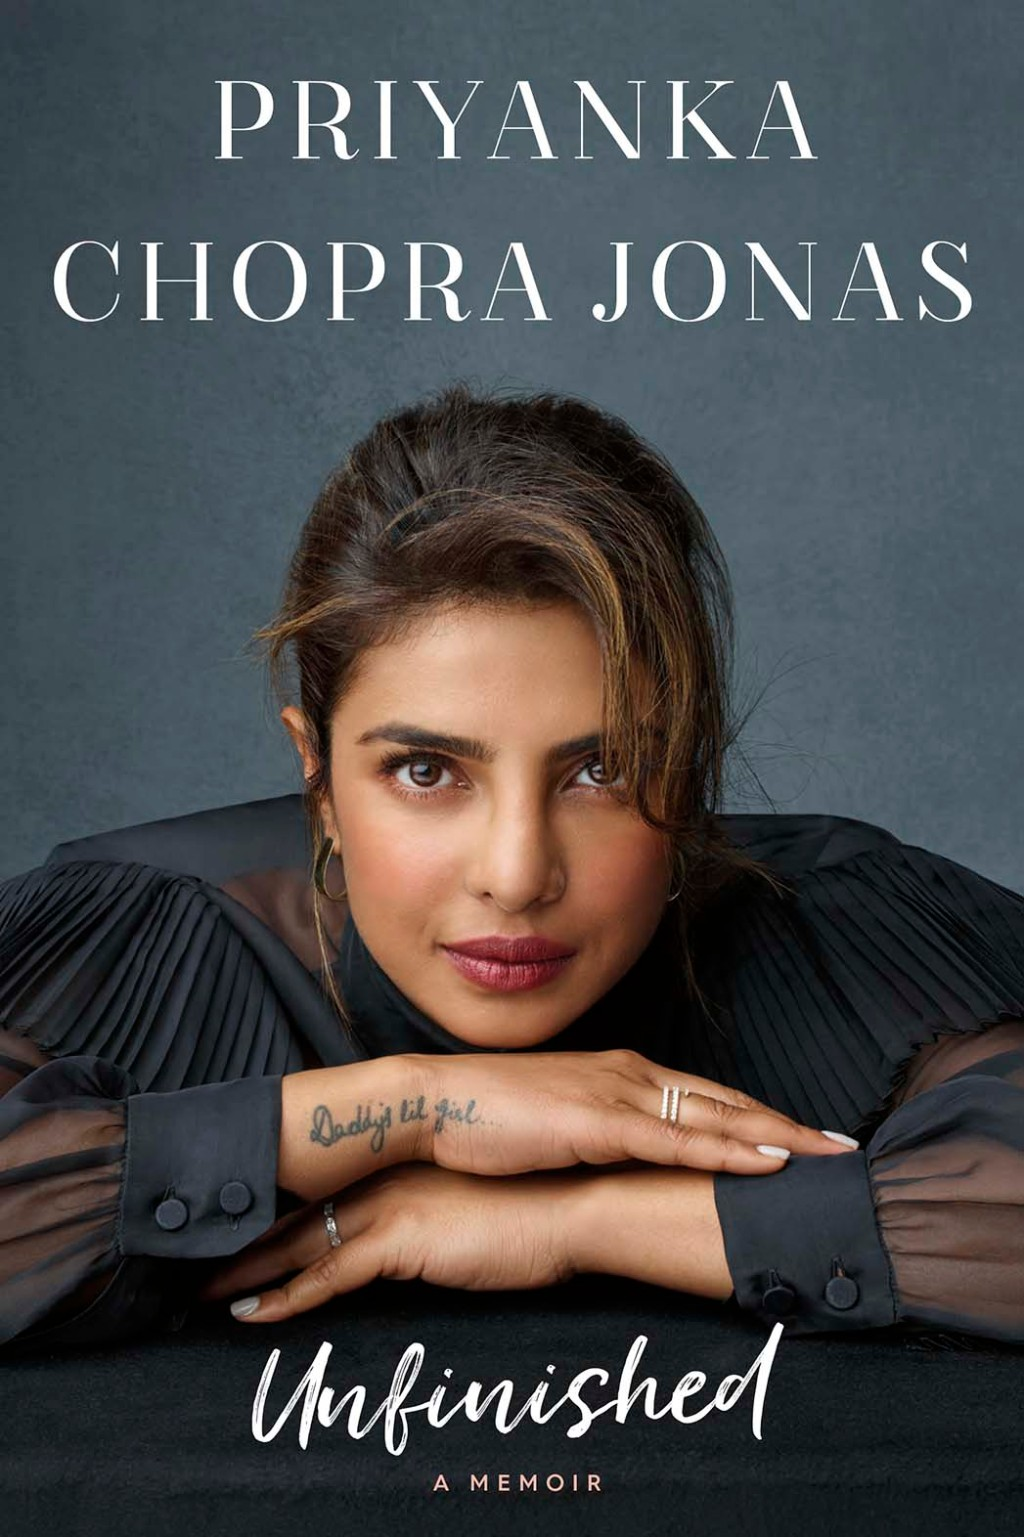 Priyanka Chopra Jonas 'Unfinished' Book Cover